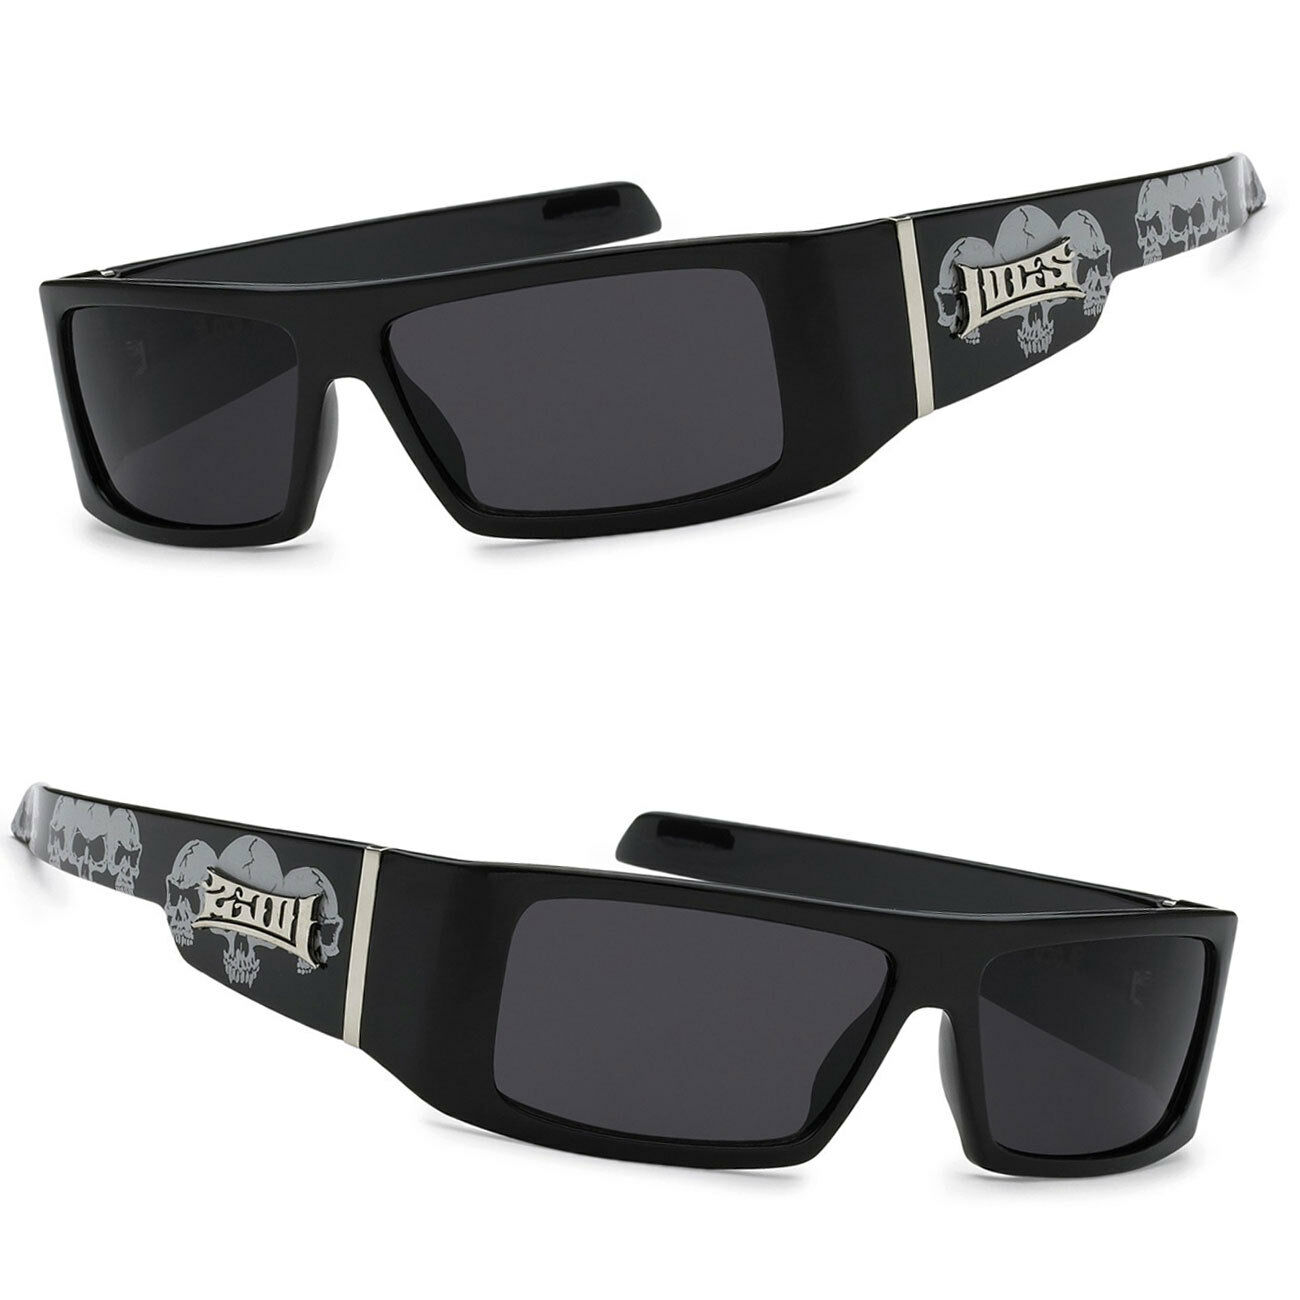 Locs Authentic Sunglasses Super Dark Lenses Motorcycle OG Style Black LC26 USD